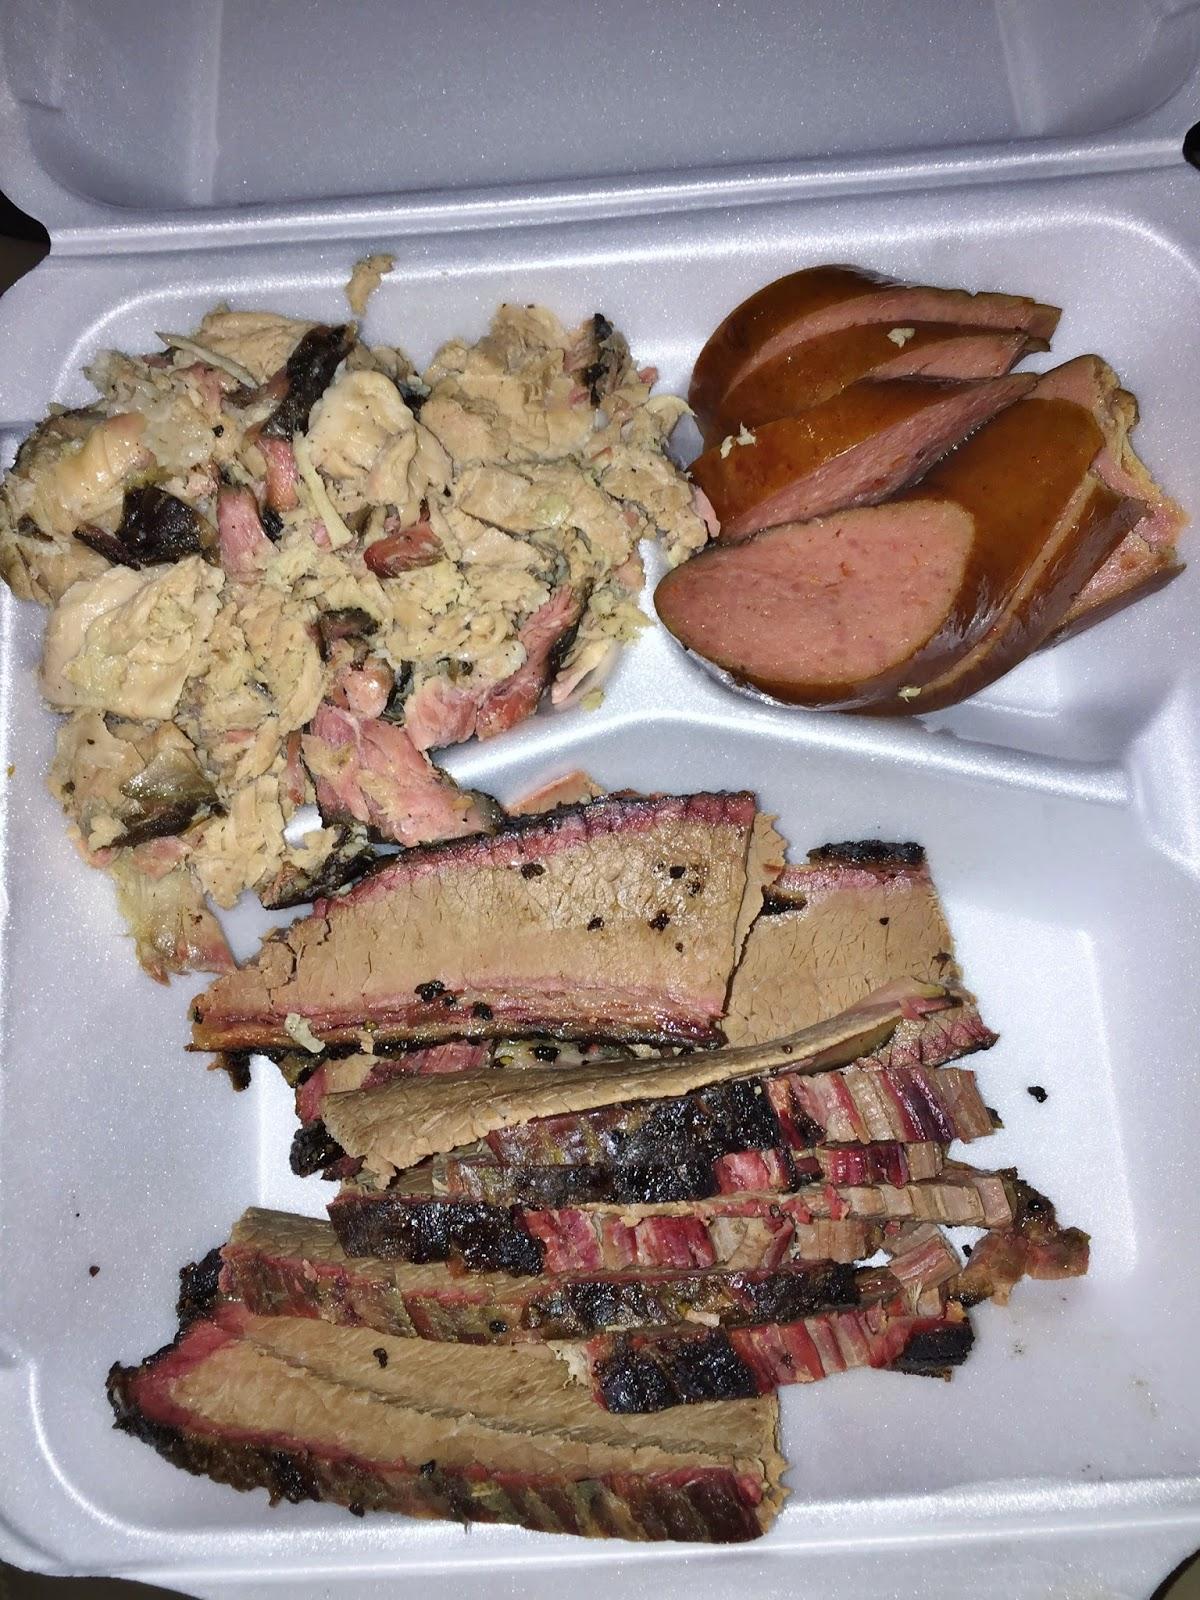 A trio of meats from Lander's: Brisket, Pulled Pork, Sliced Sausage